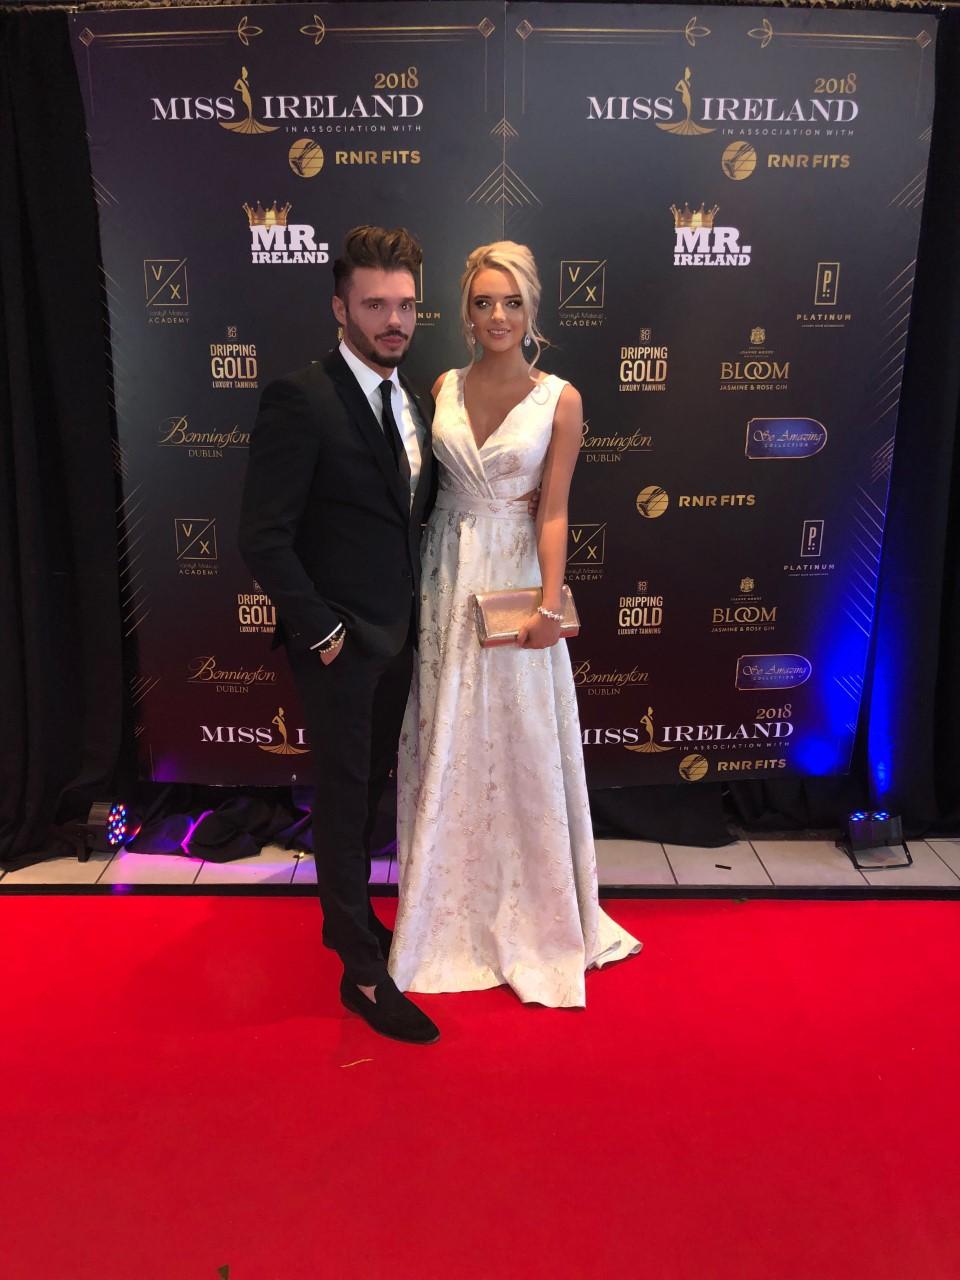 With Tara O'Leary at Miss Ireland 2018